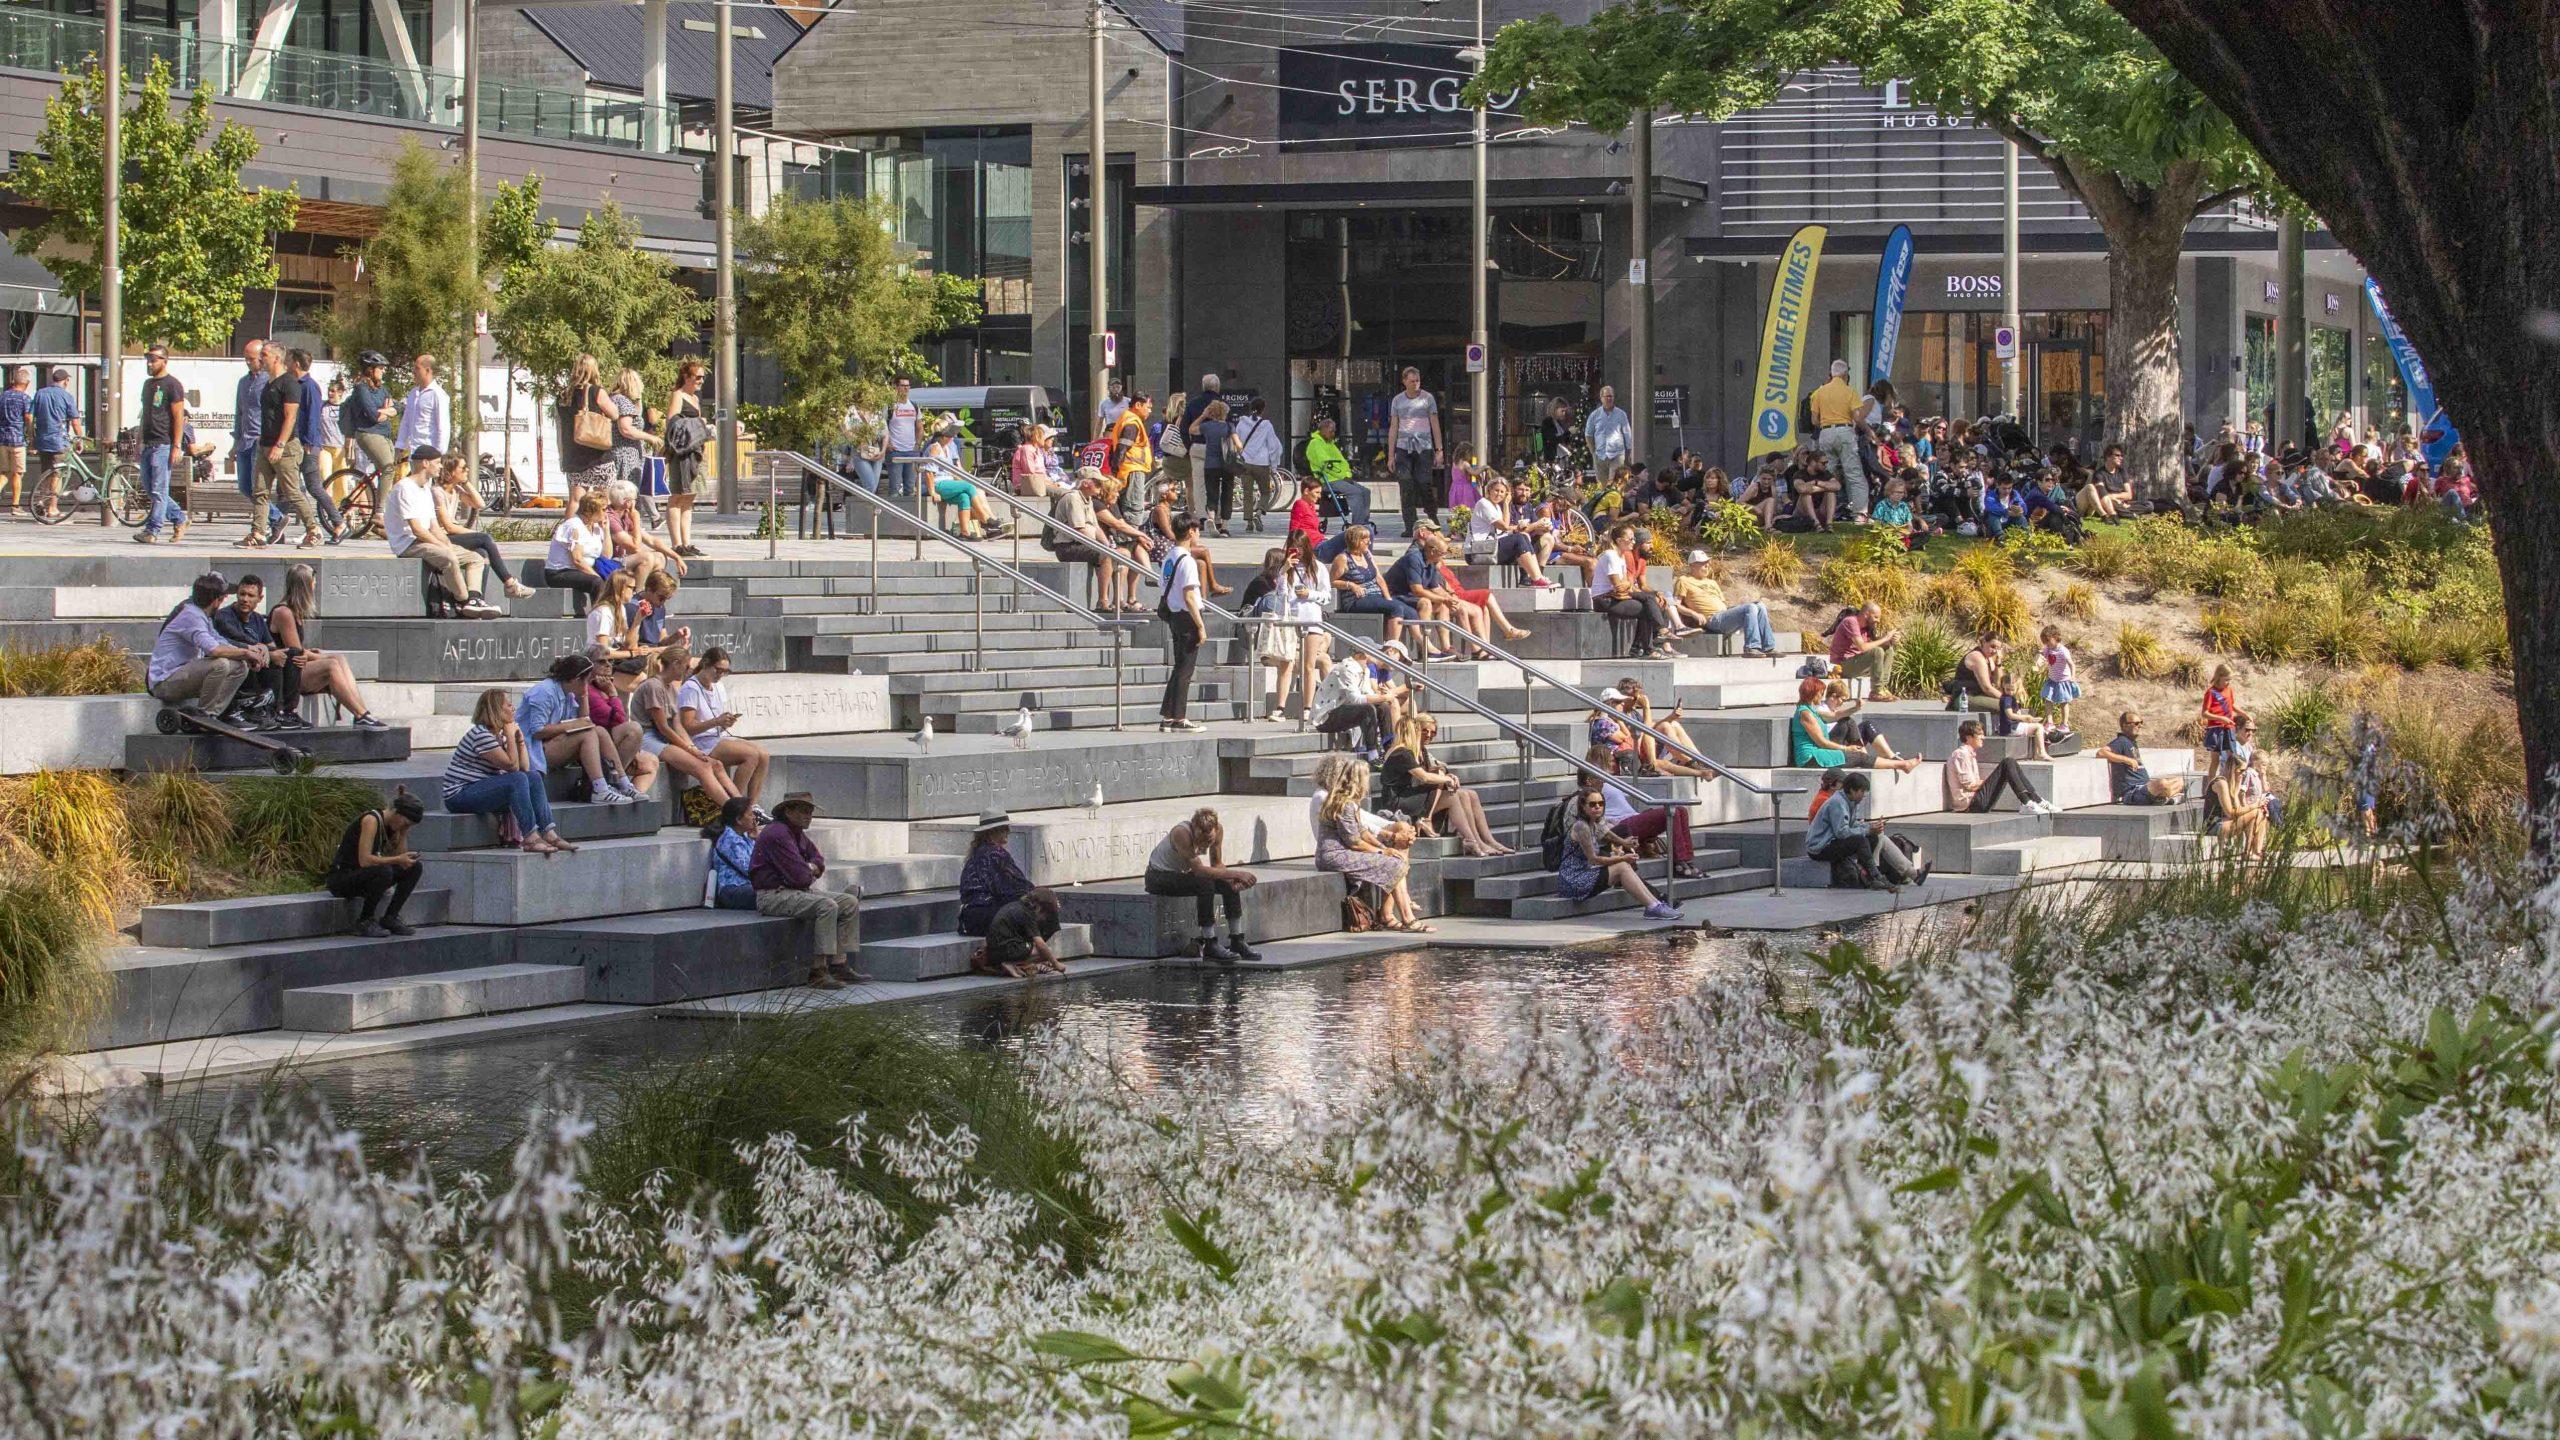 Christchurch goes live on NZ Venues